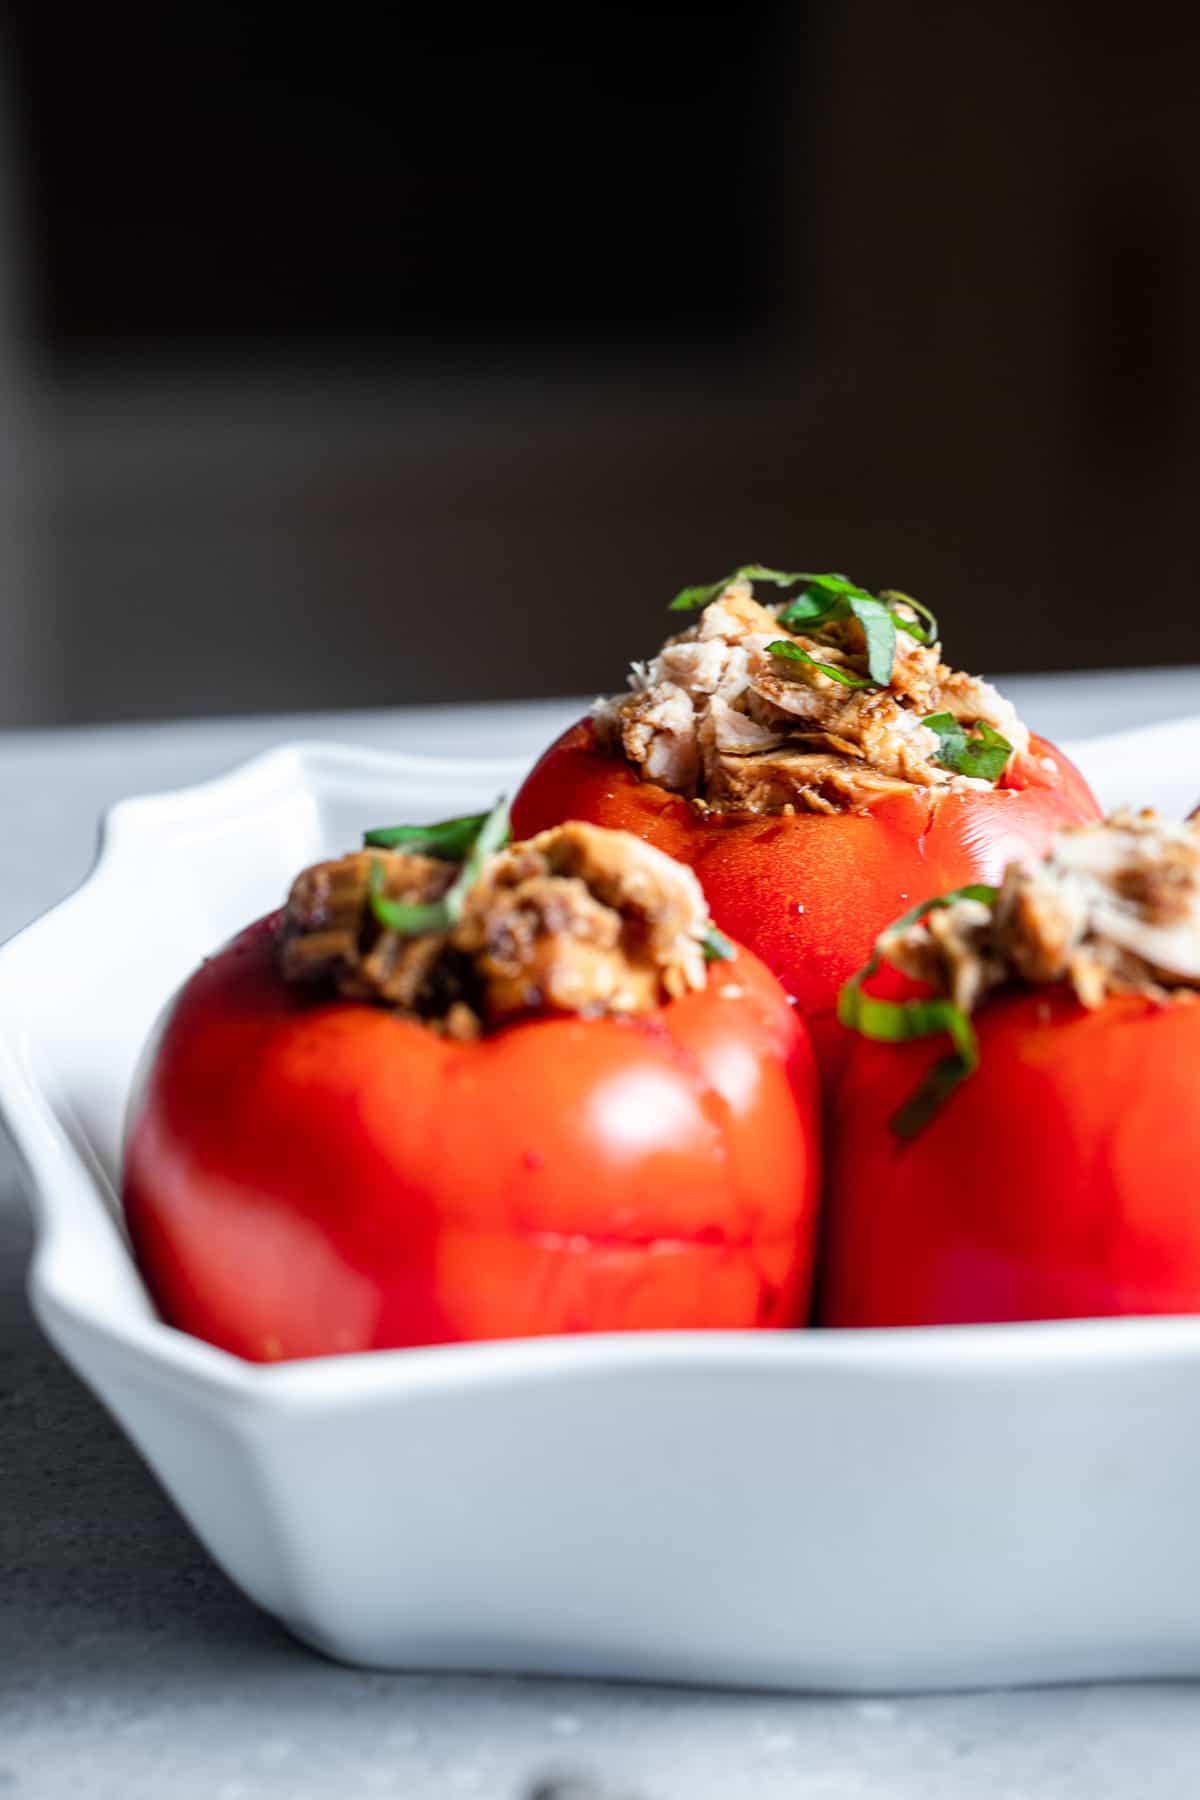 tuna stuffed tomatoes in a serving dish